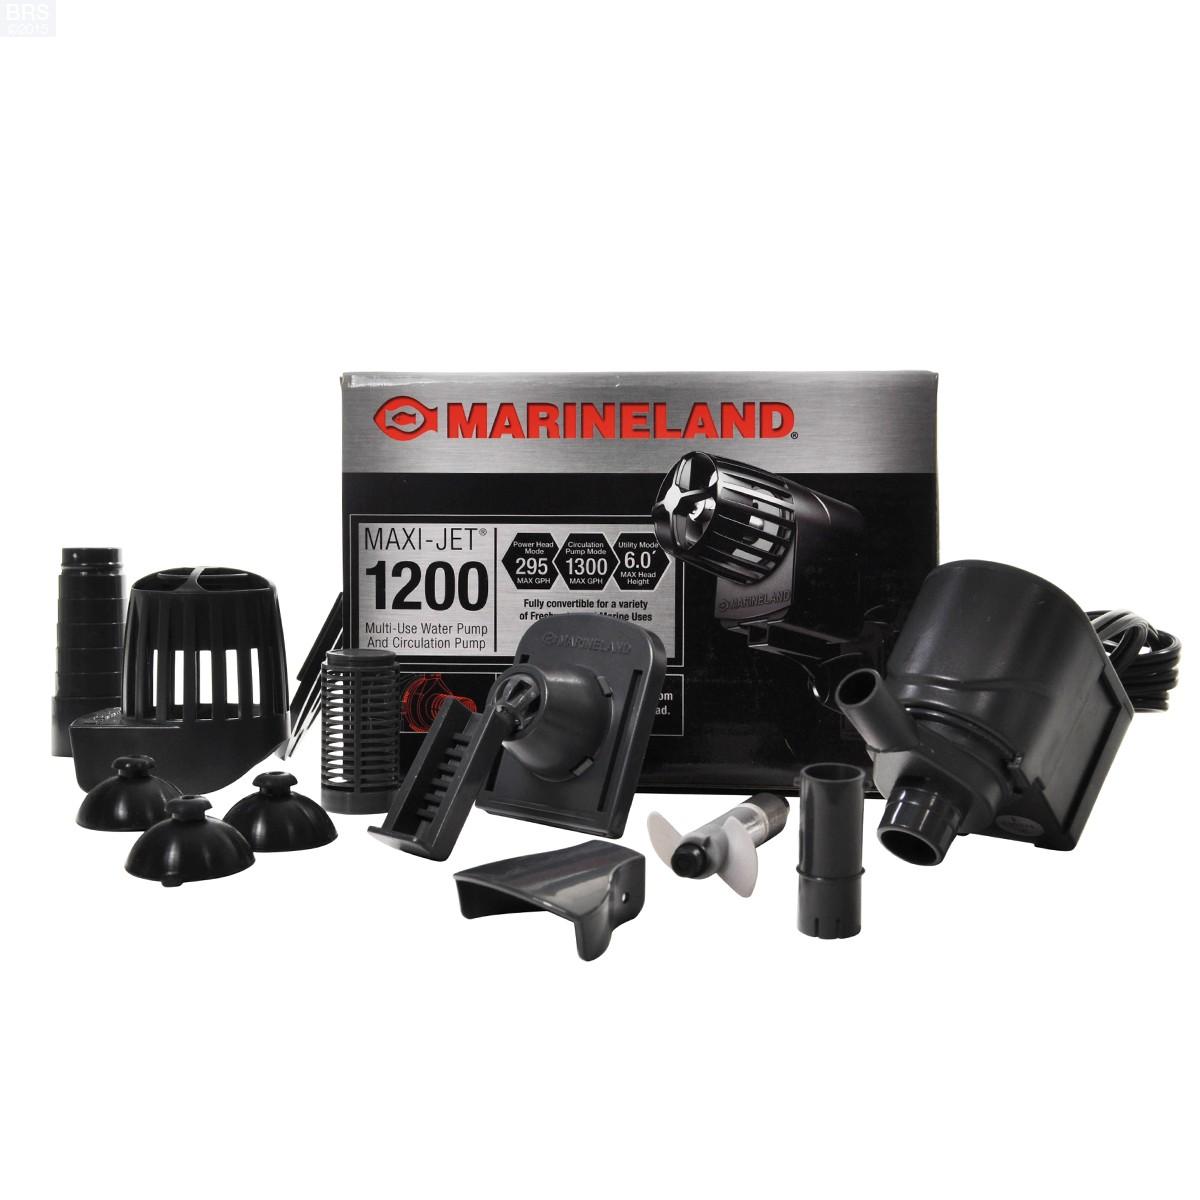 Marineland Maxi-Jet Powerhead 1200 - Bulk Reef Supply